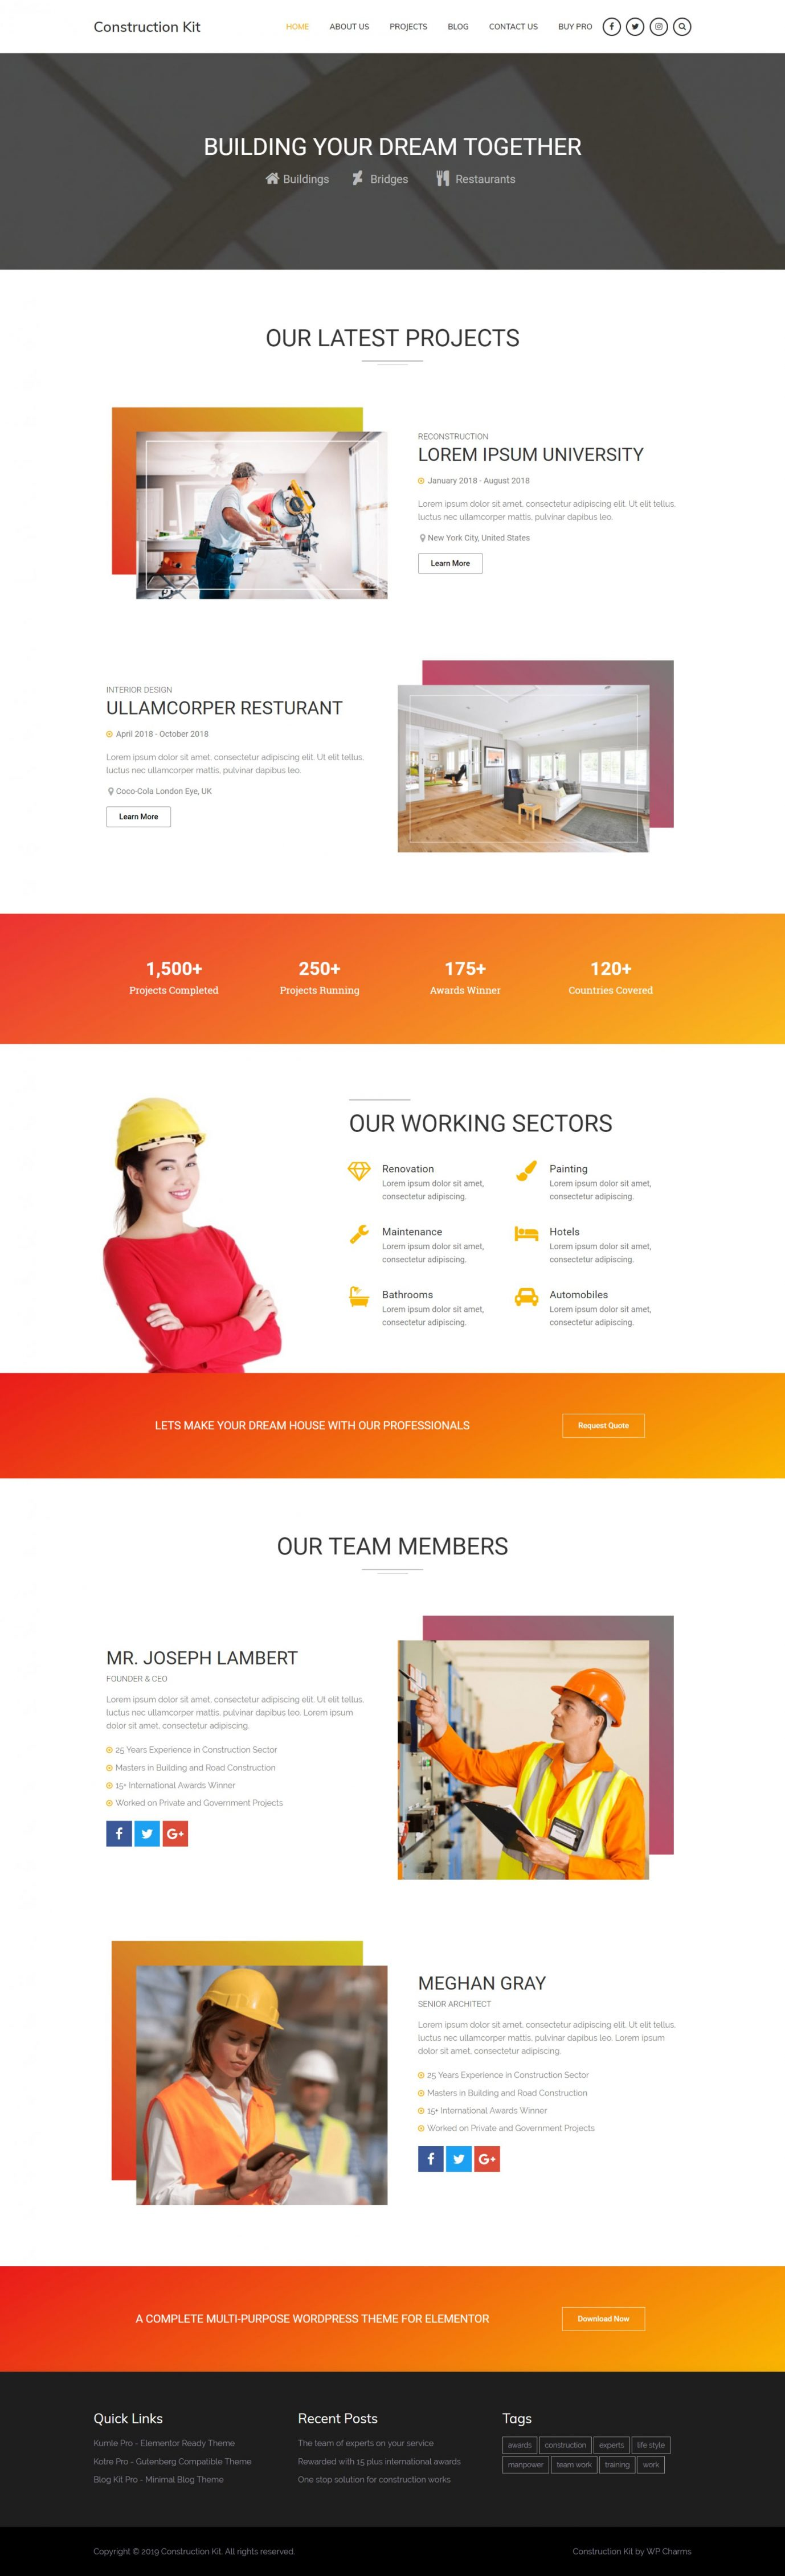 Construction Kit - Free WordPress Construction Theme